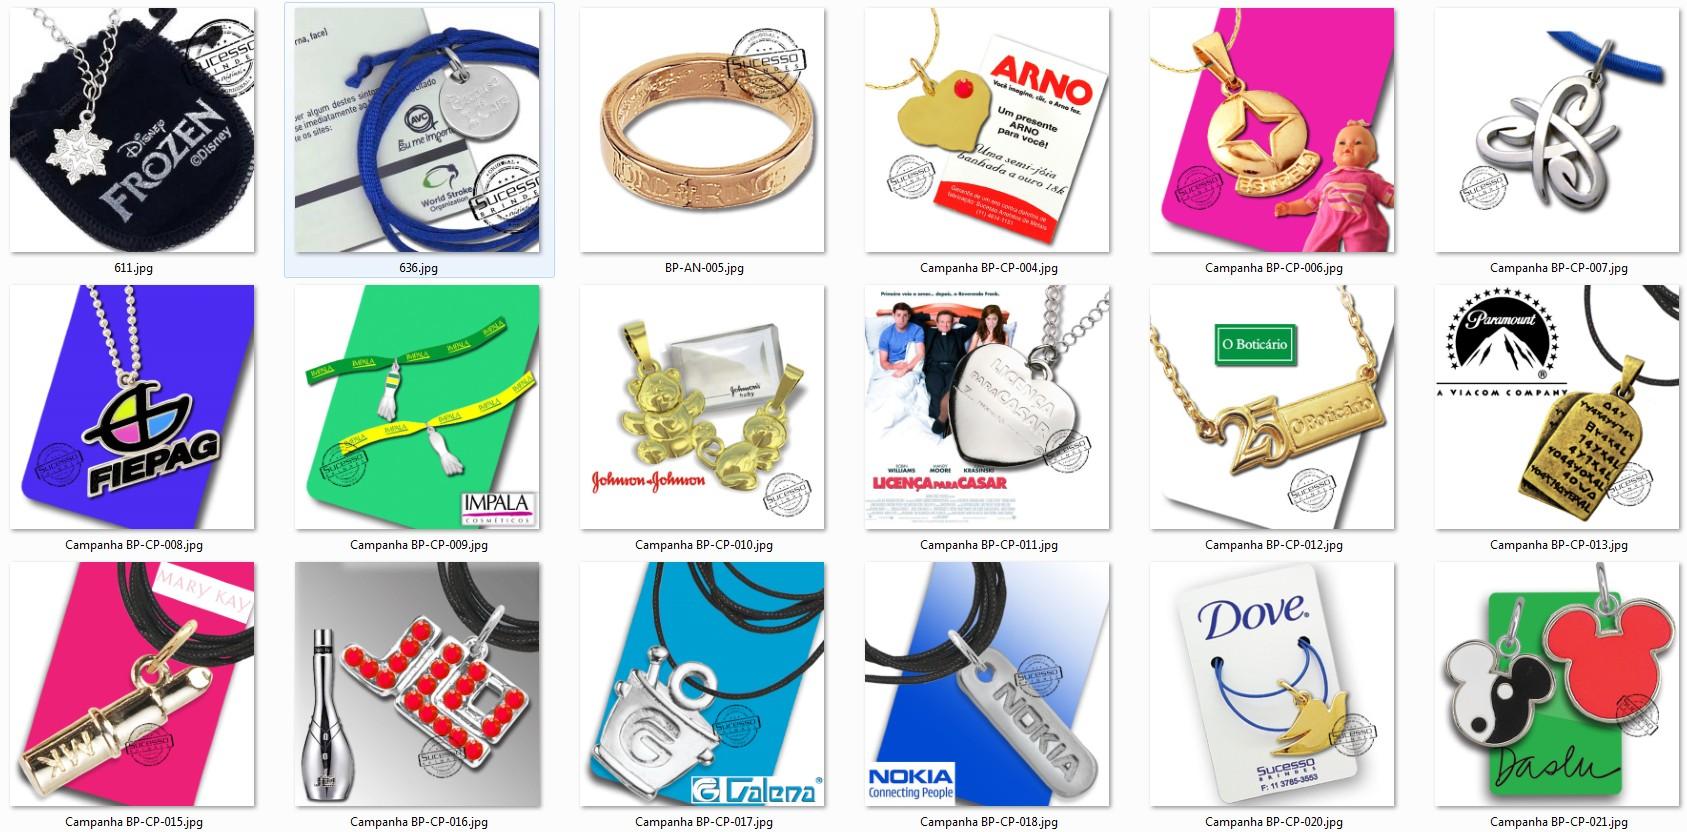 bijuteria promocional personalizada anel pulseira corrente pingente 1